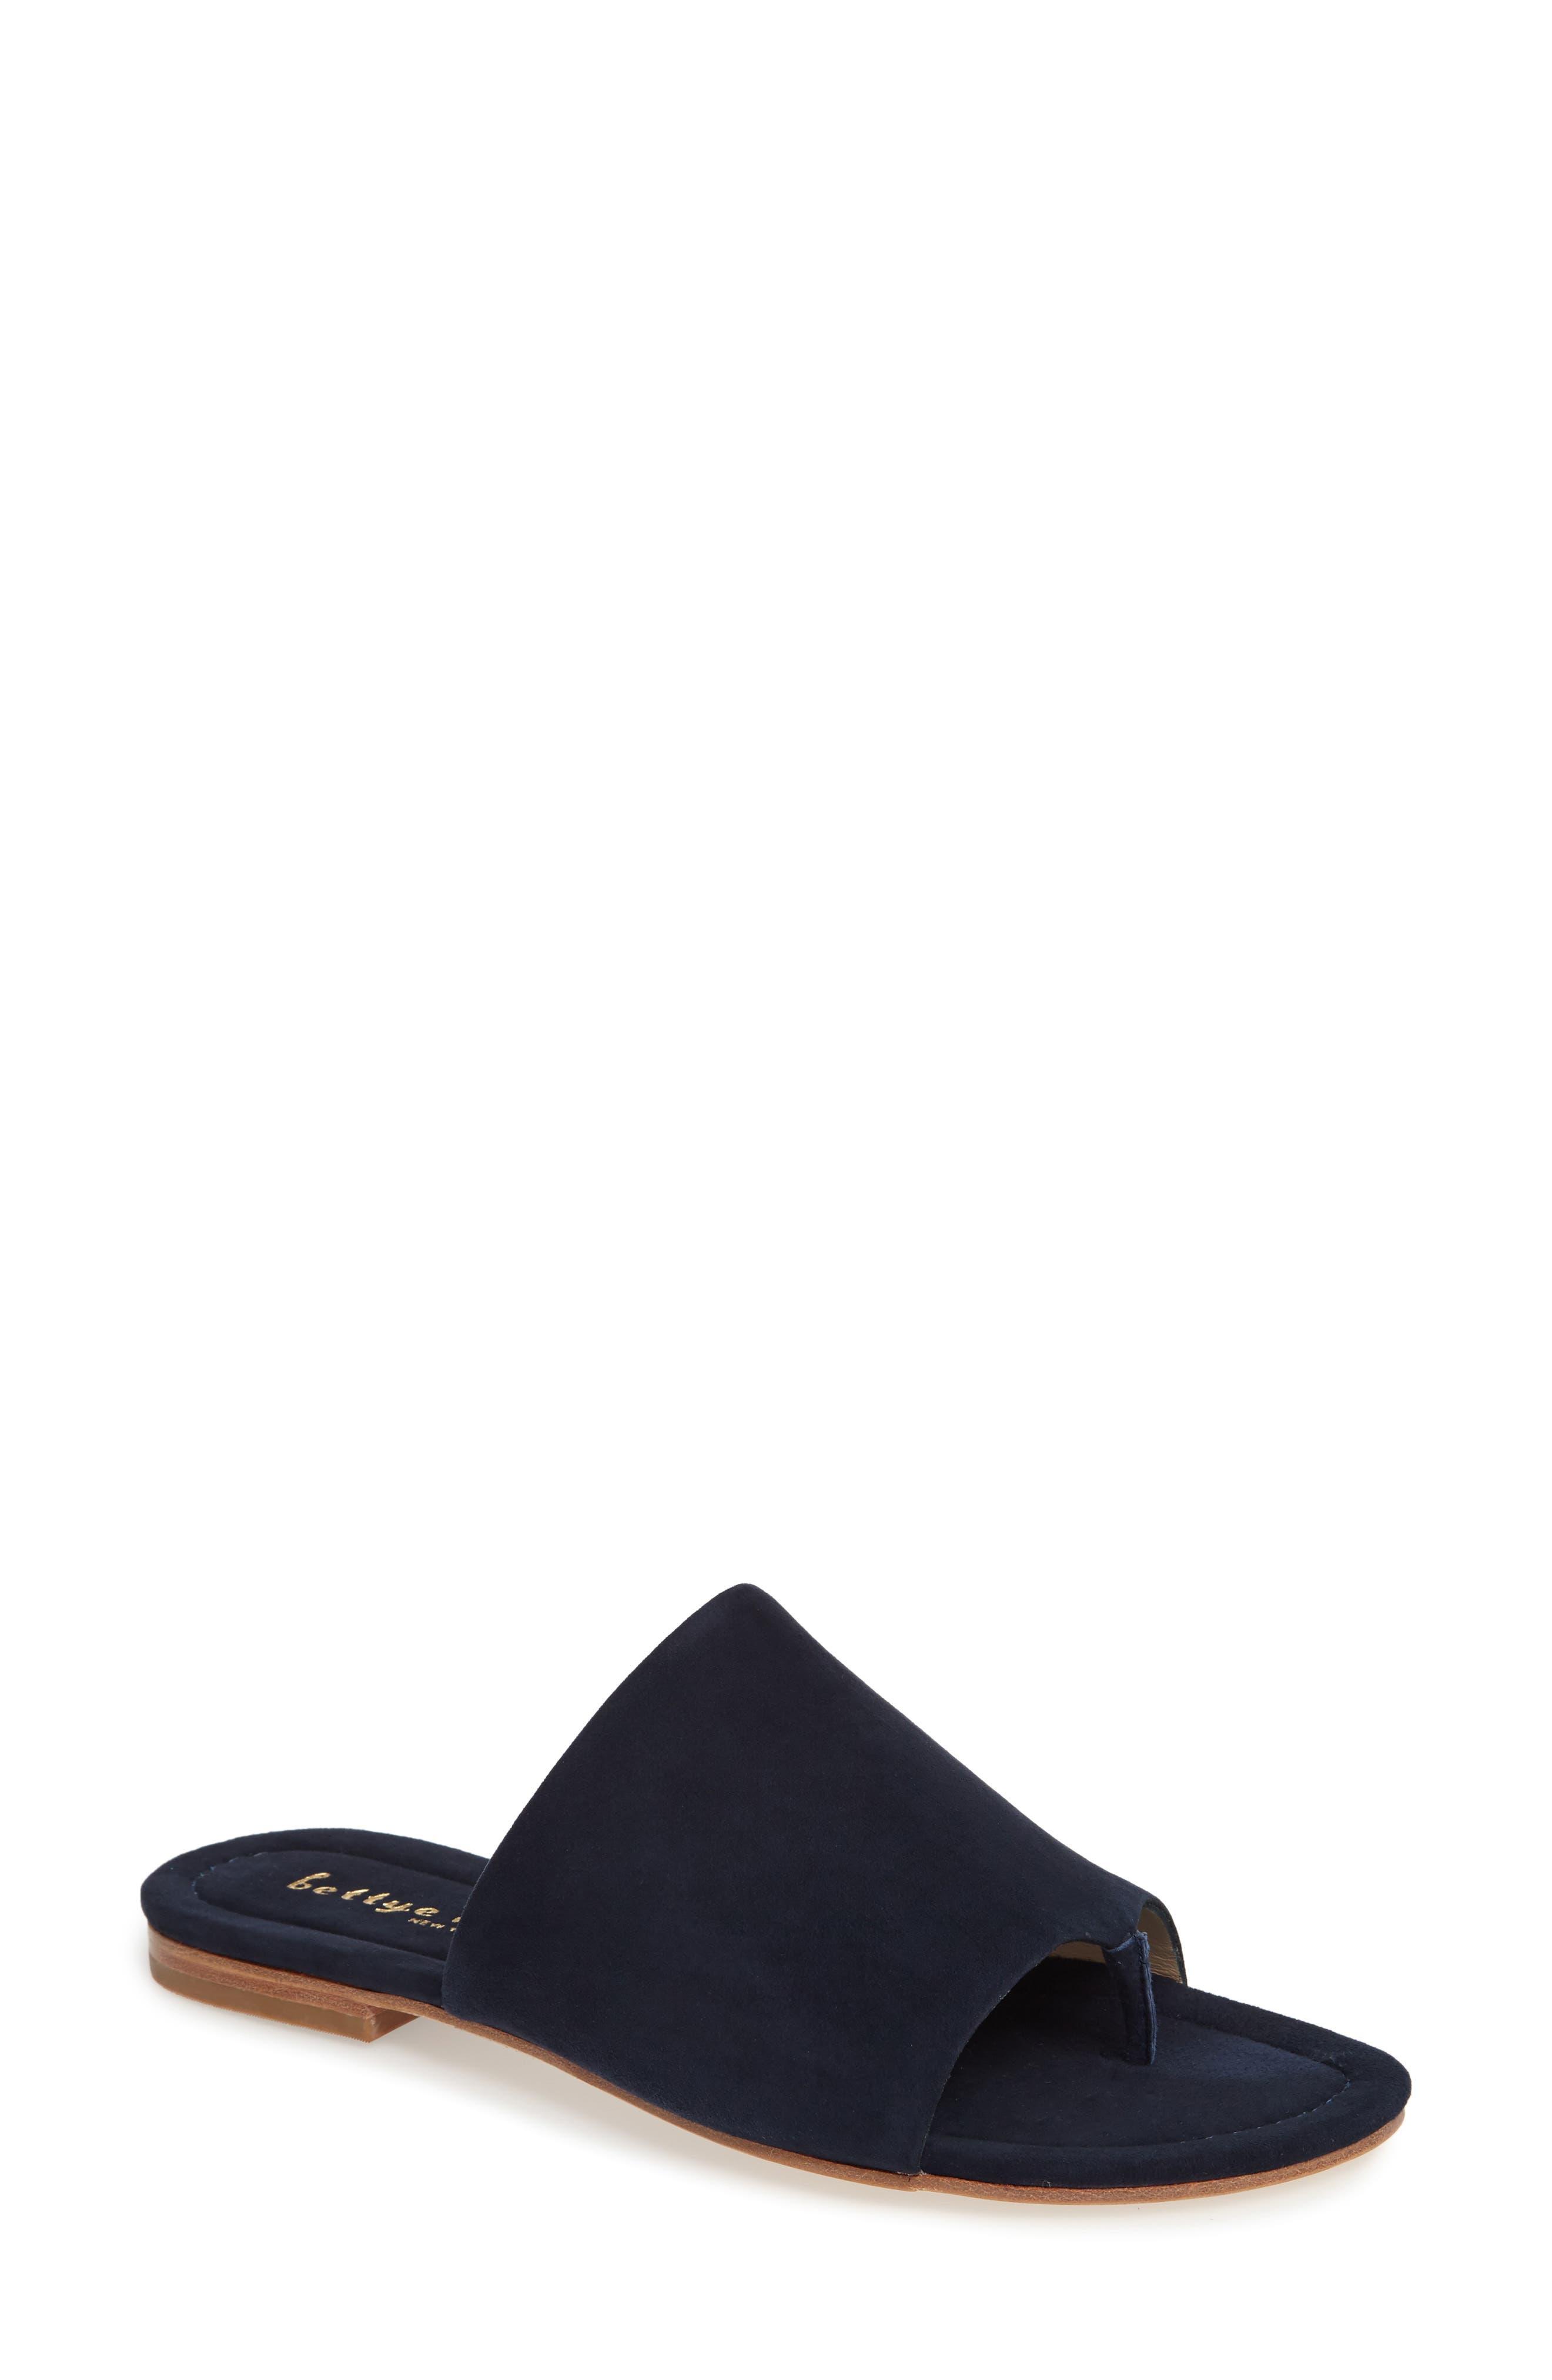 Bettye Muller 'Sloane' Sandal (Women)